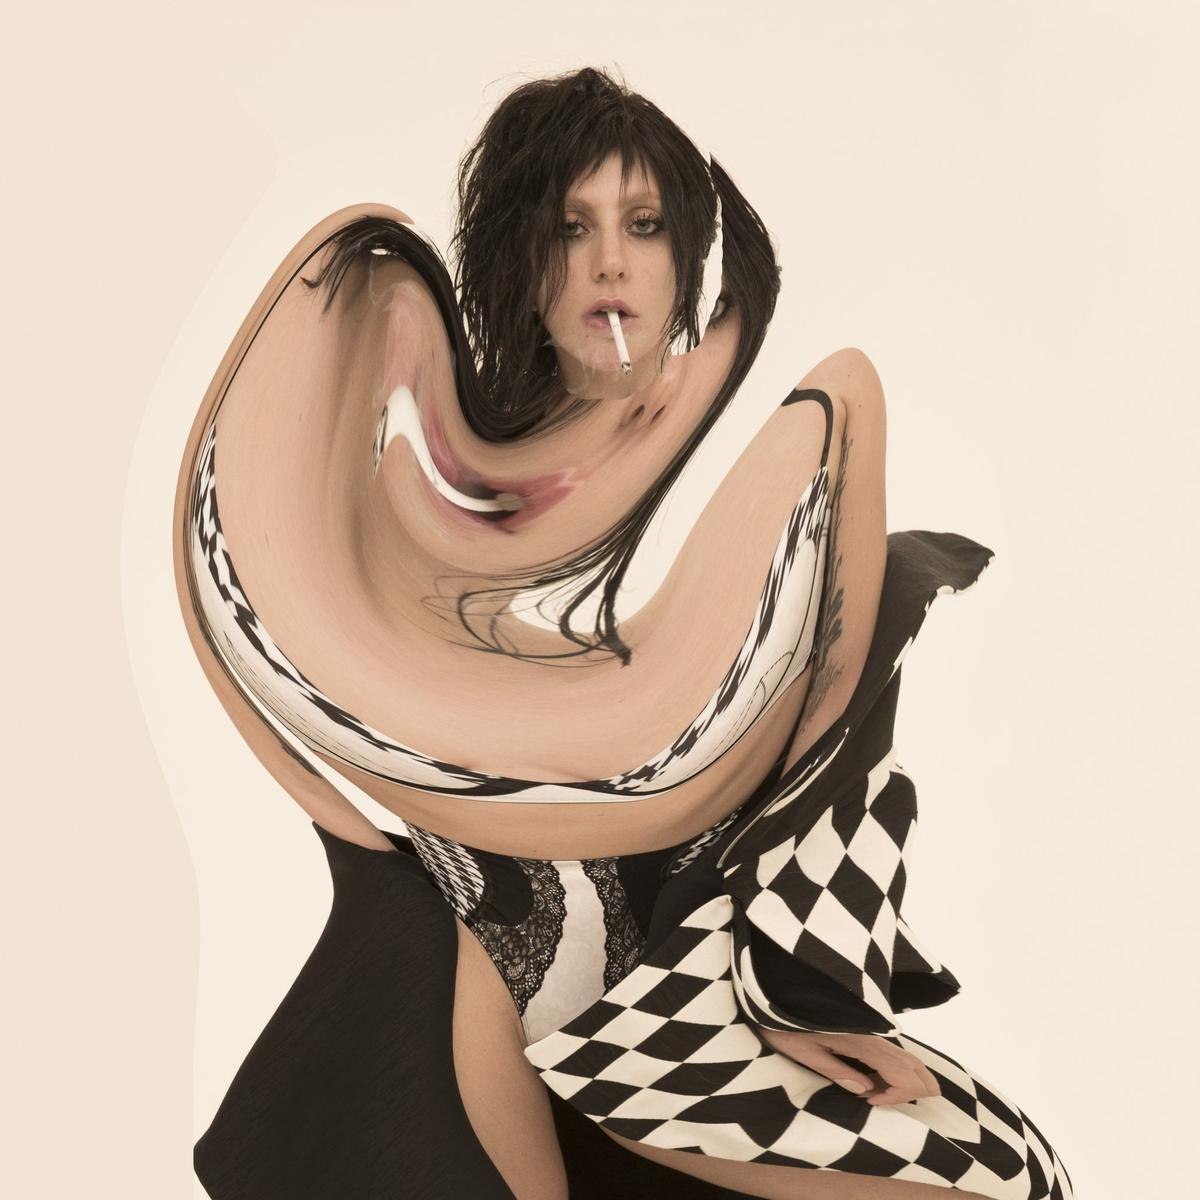 Inez & Vinoodh Photo Shoot [V Magazine]